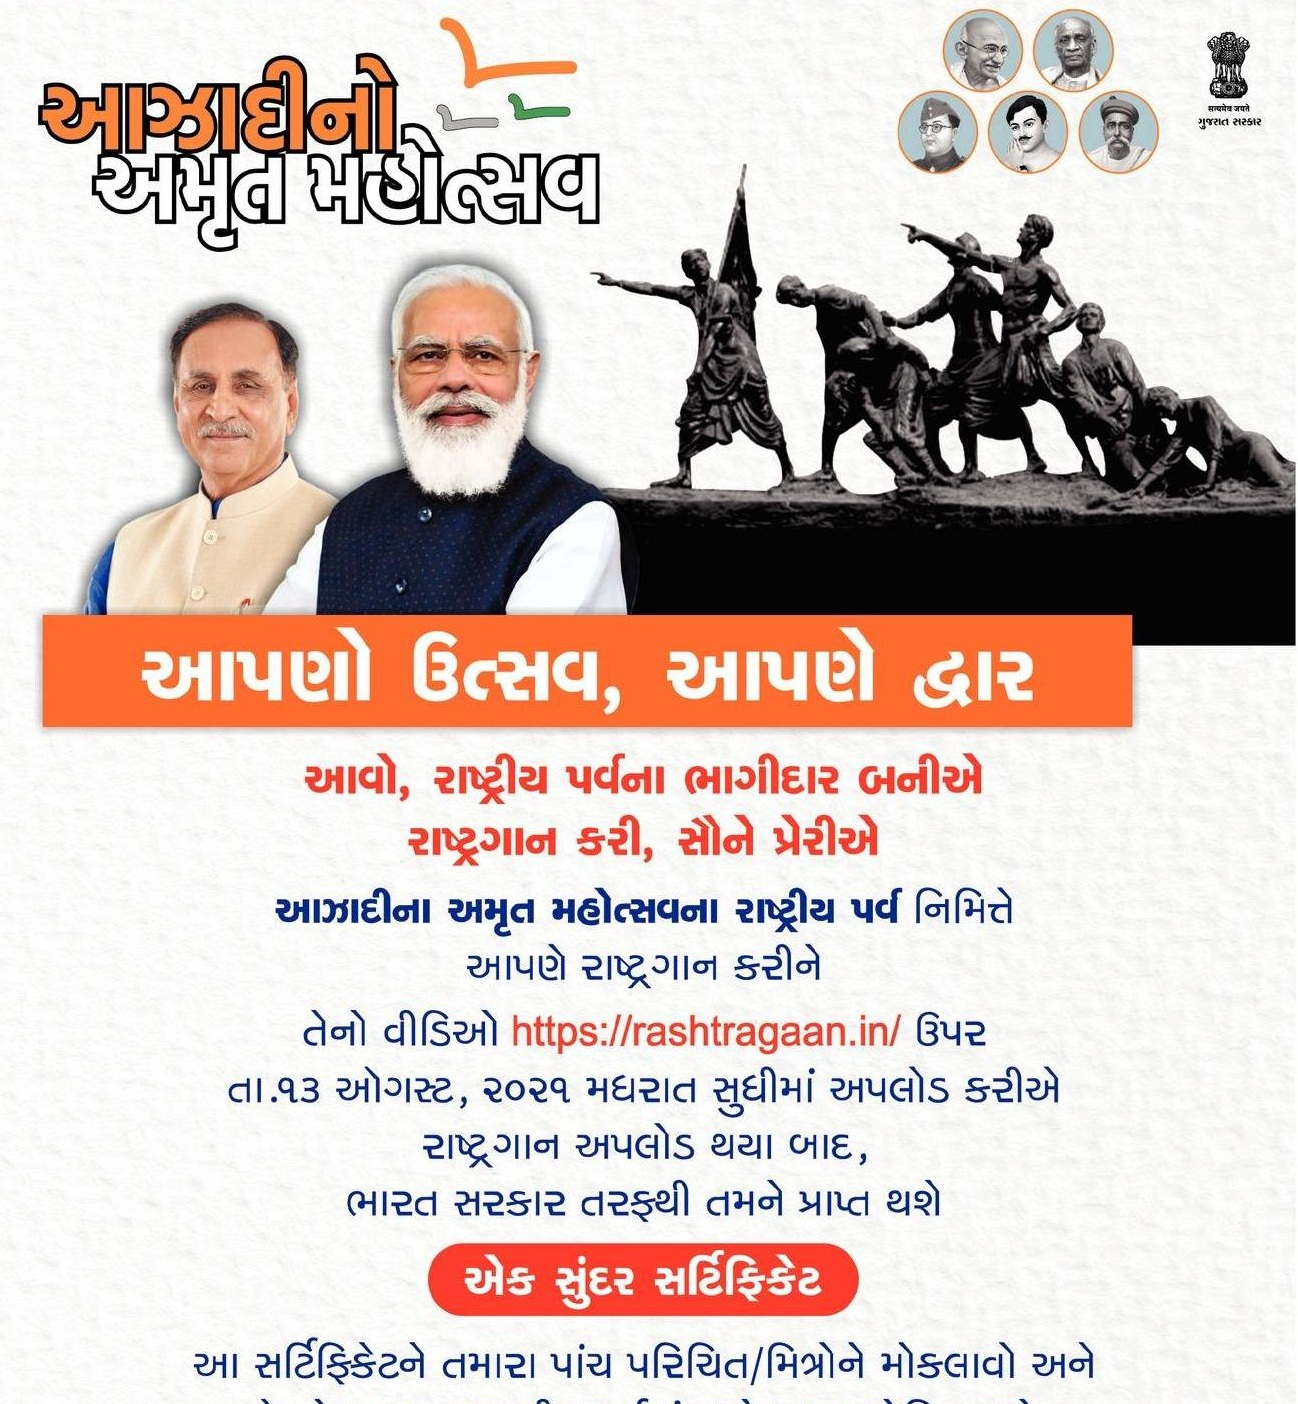 Azadi Ka Amrut Mahotsav Certificate | Azadi Ka Amrut Mahotsav Certificate Download